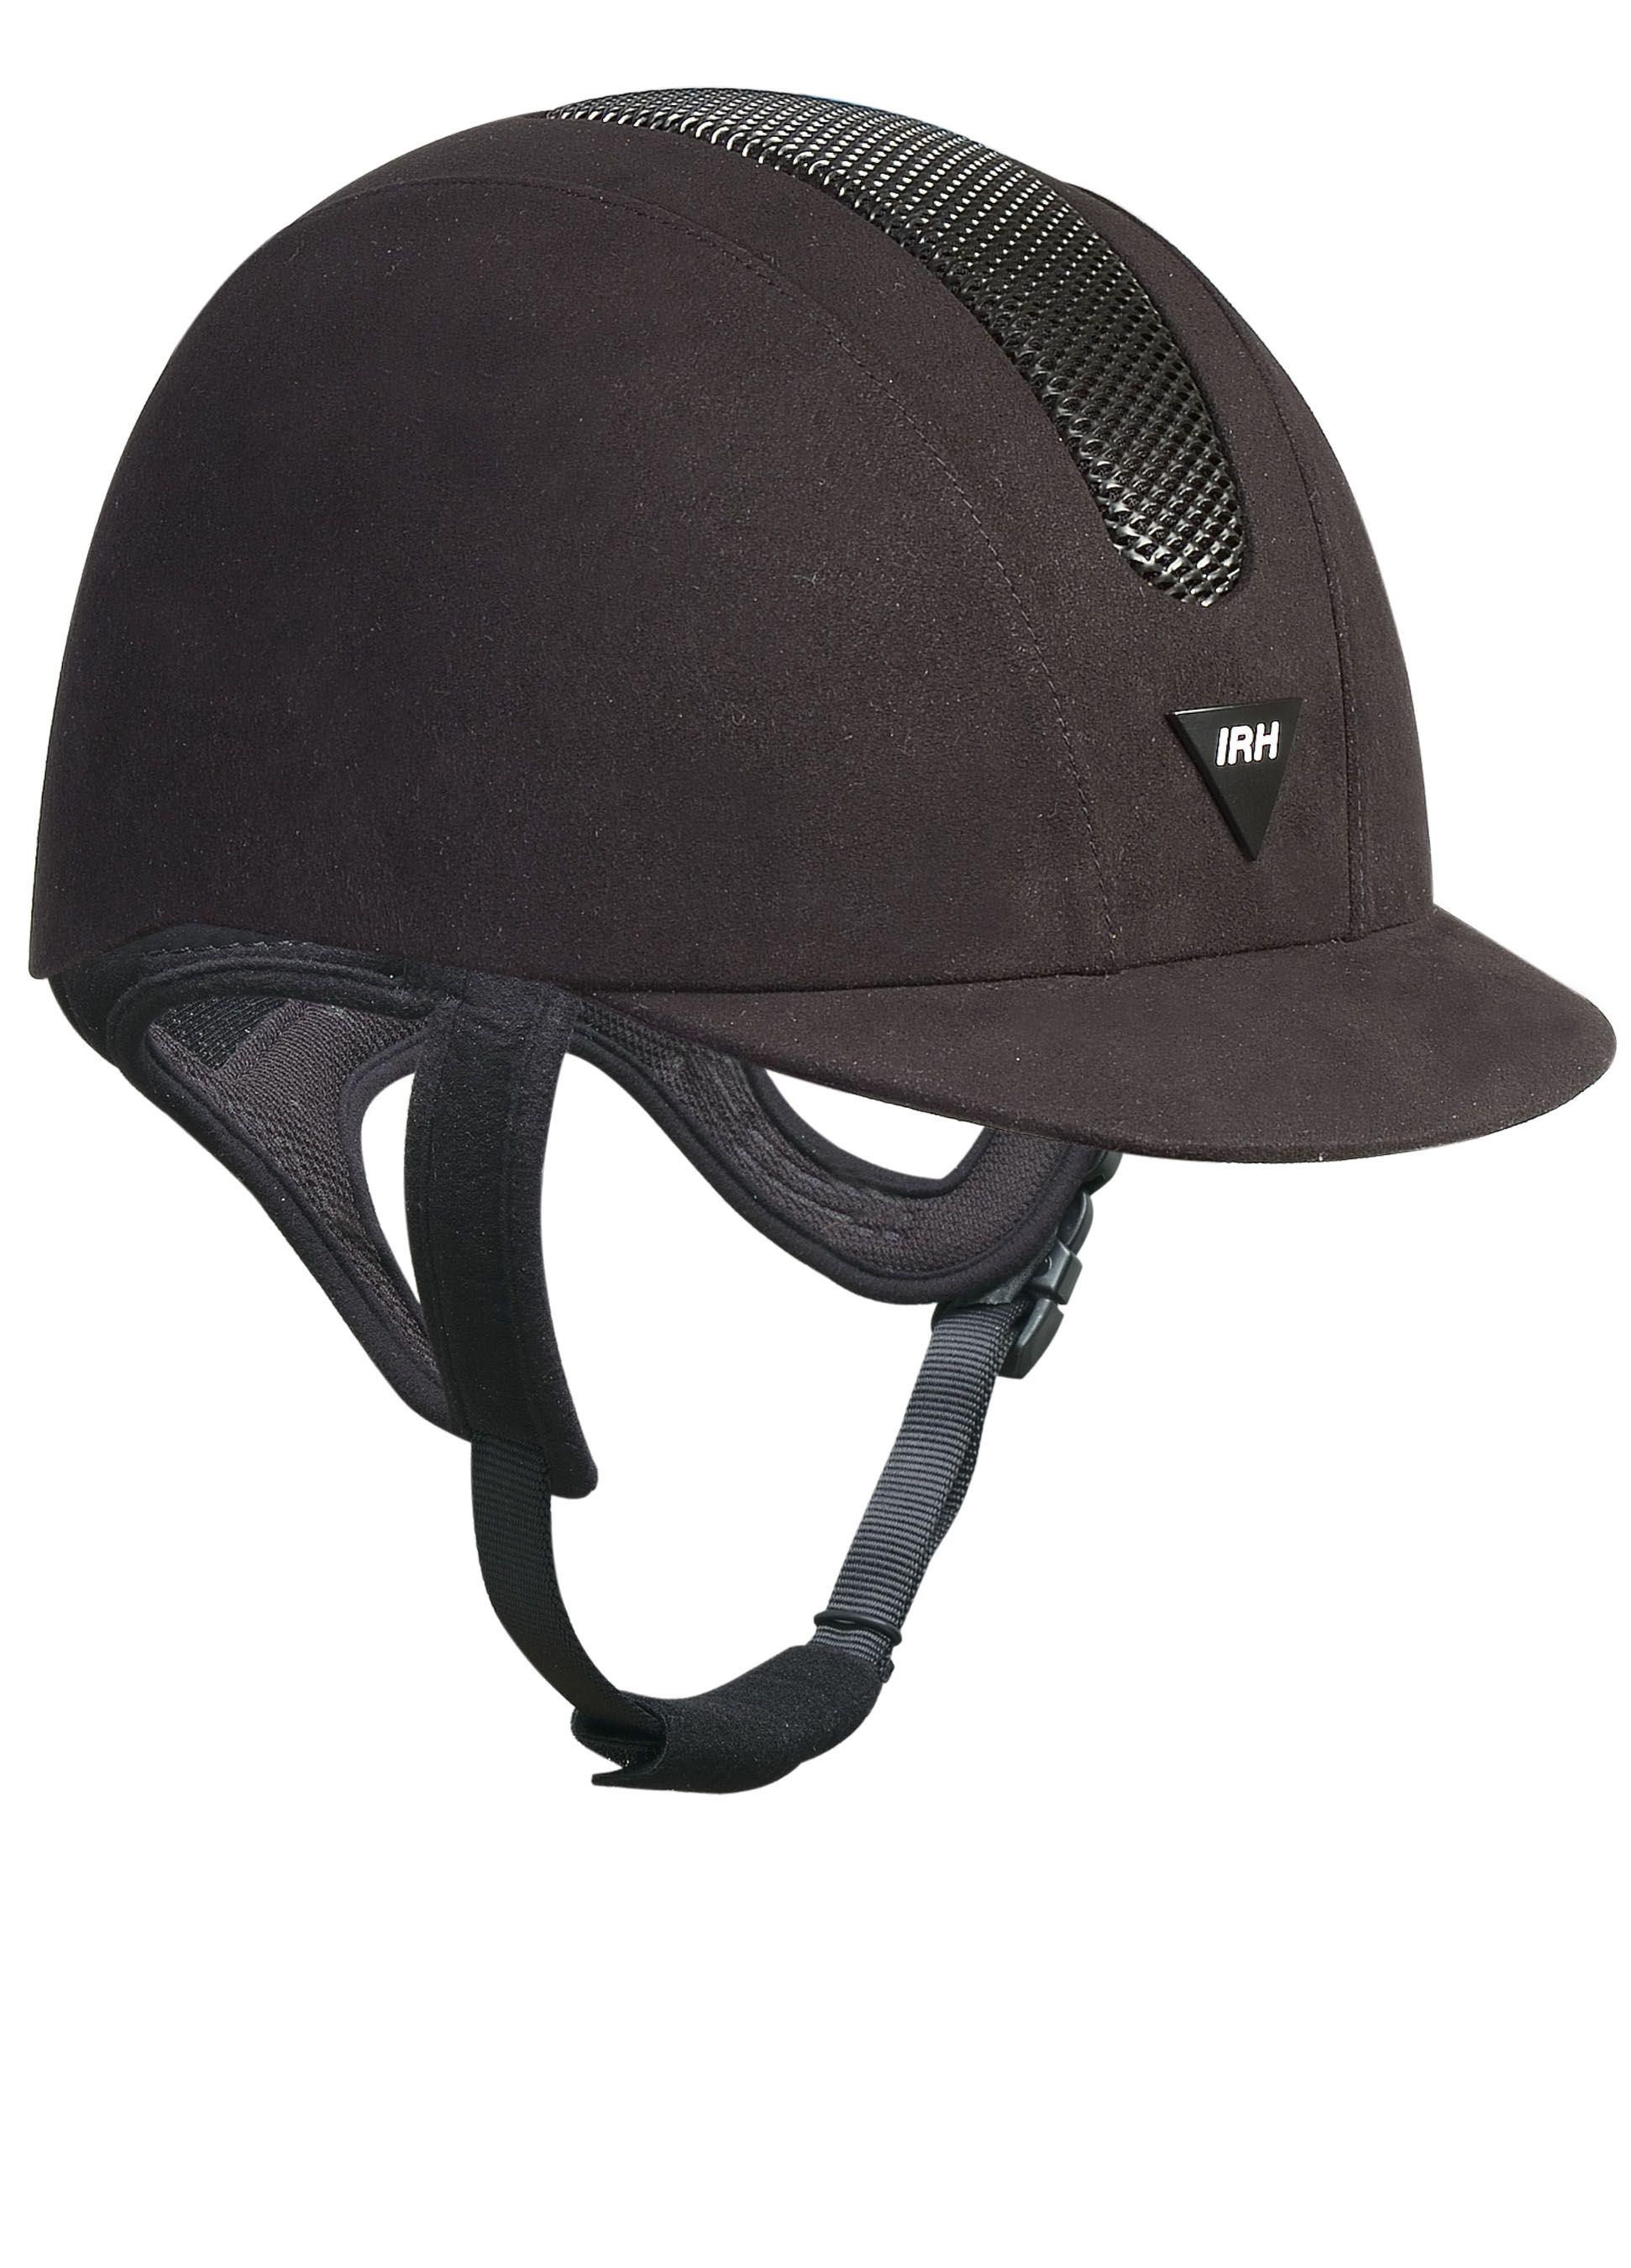 IRH SSV ATH Helmet